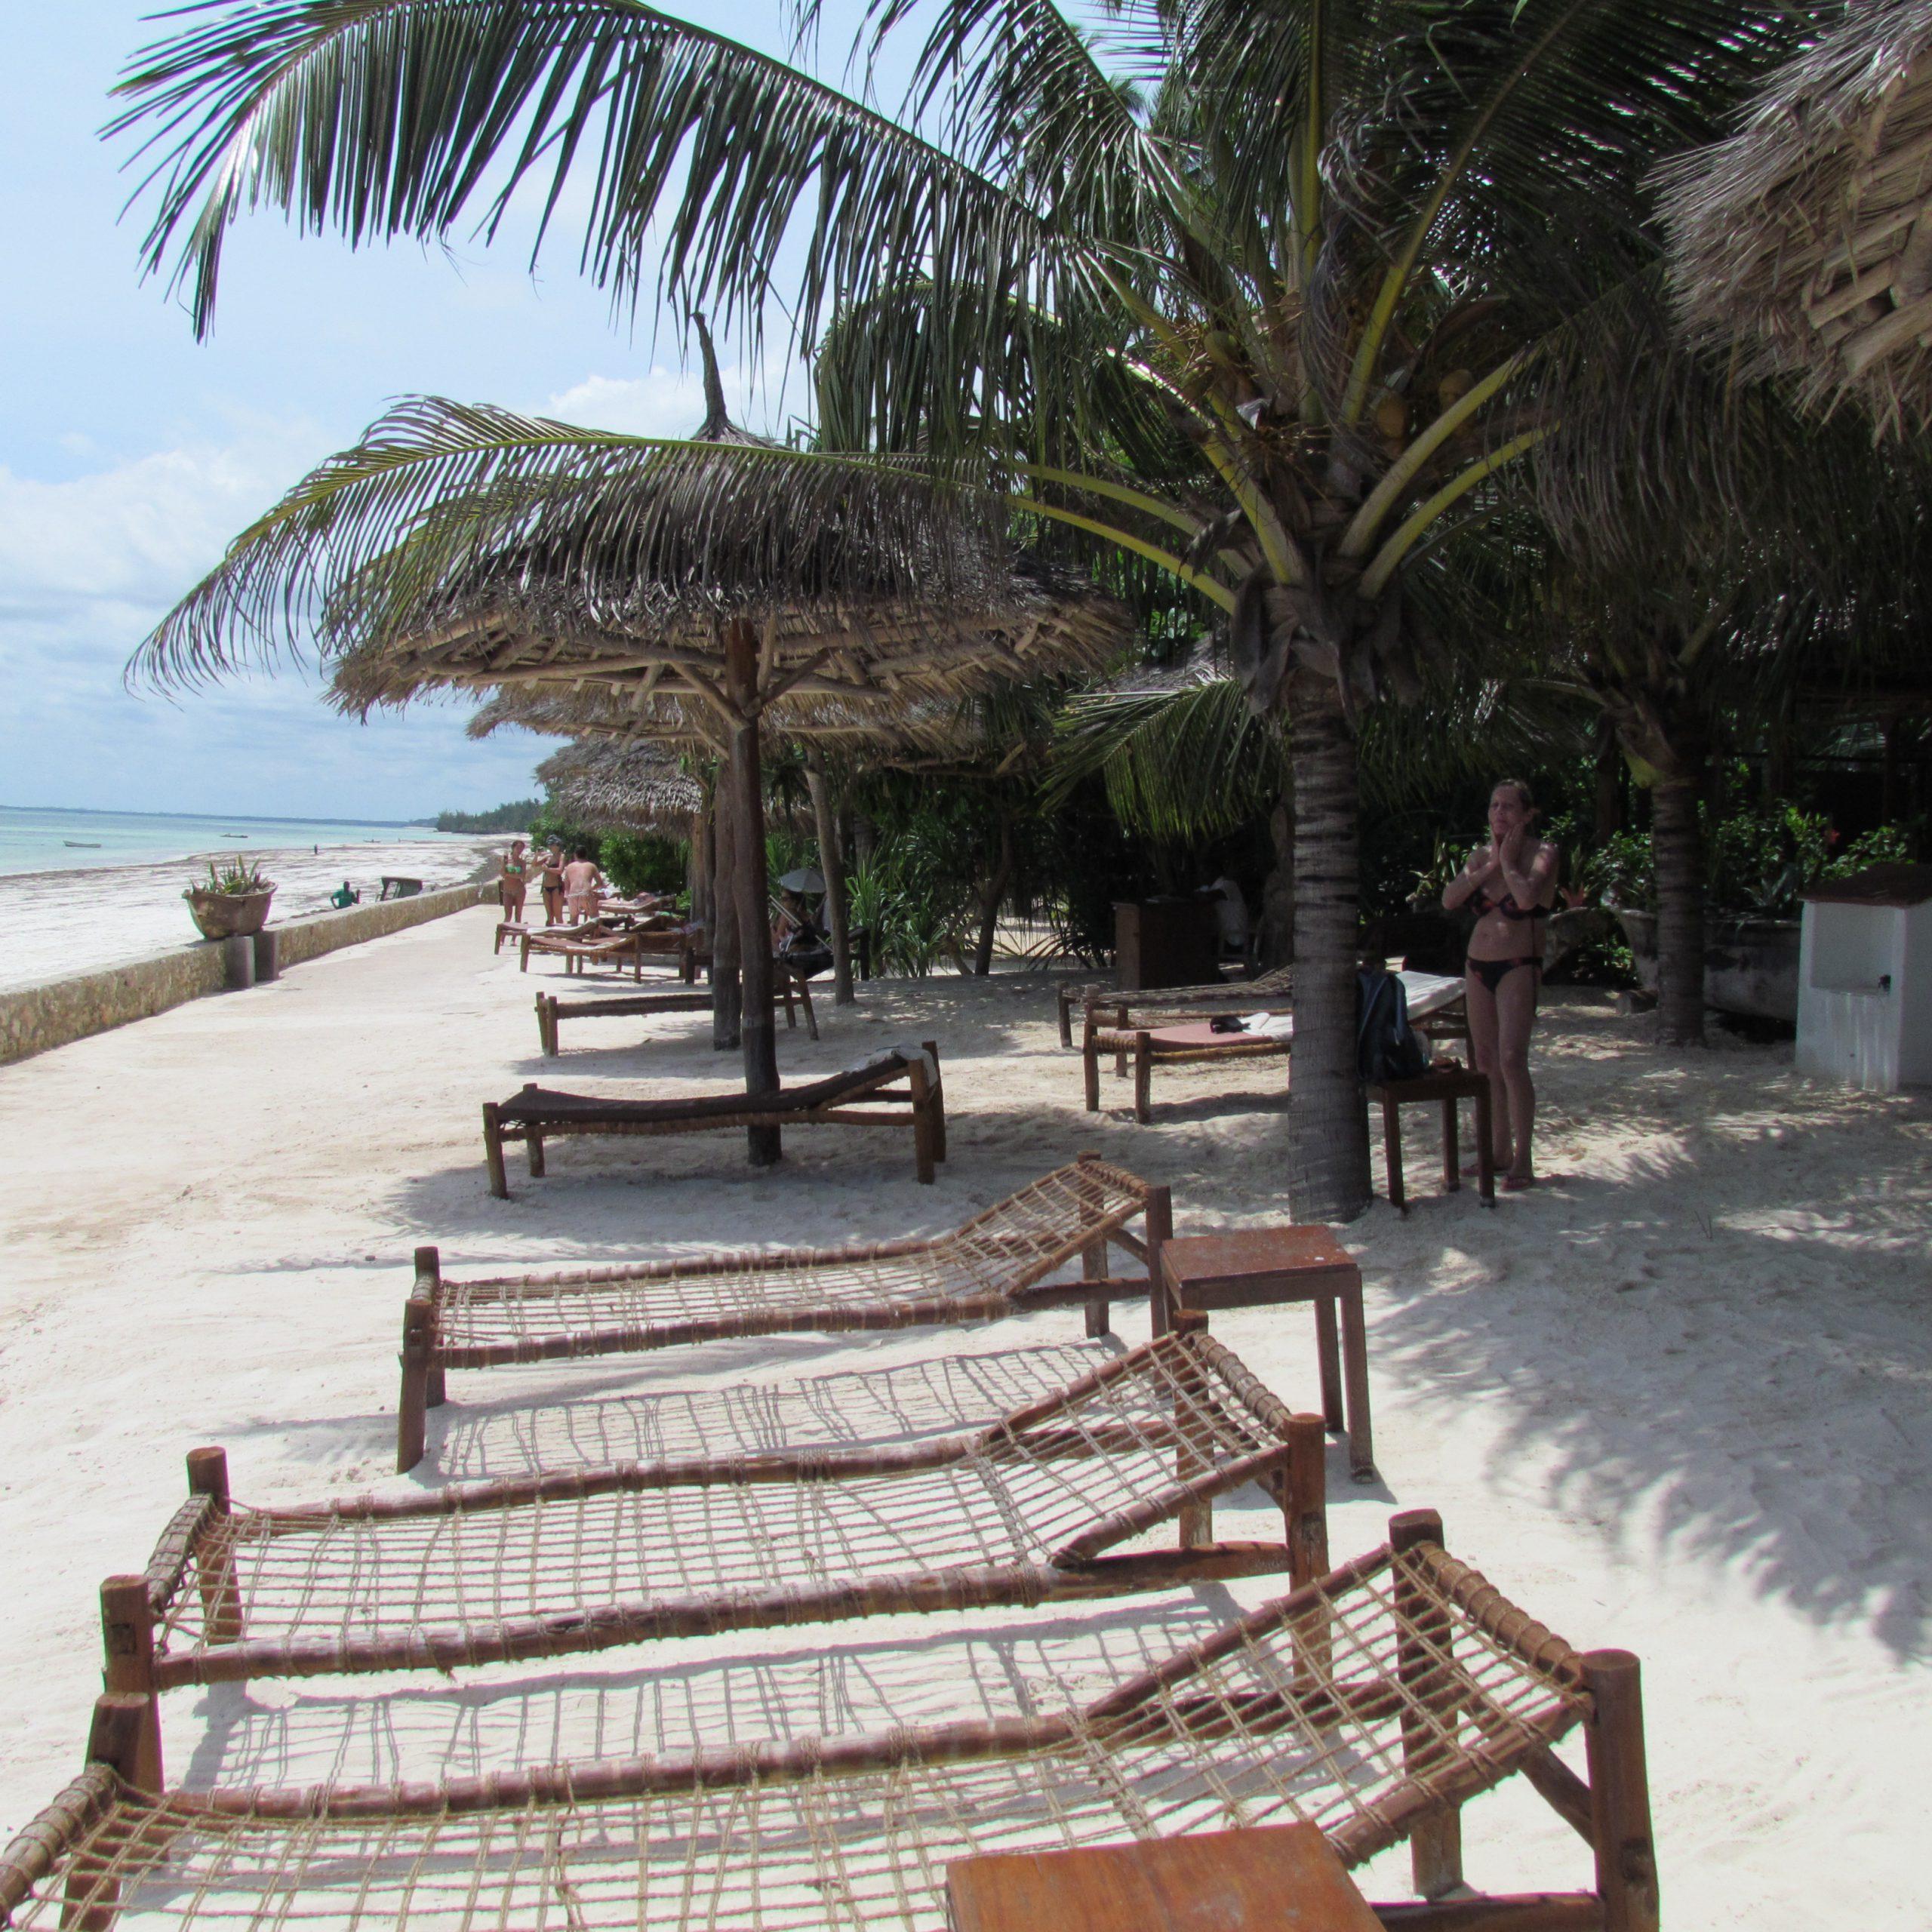 Day 4 & 6: Matemwe Beach Leisure